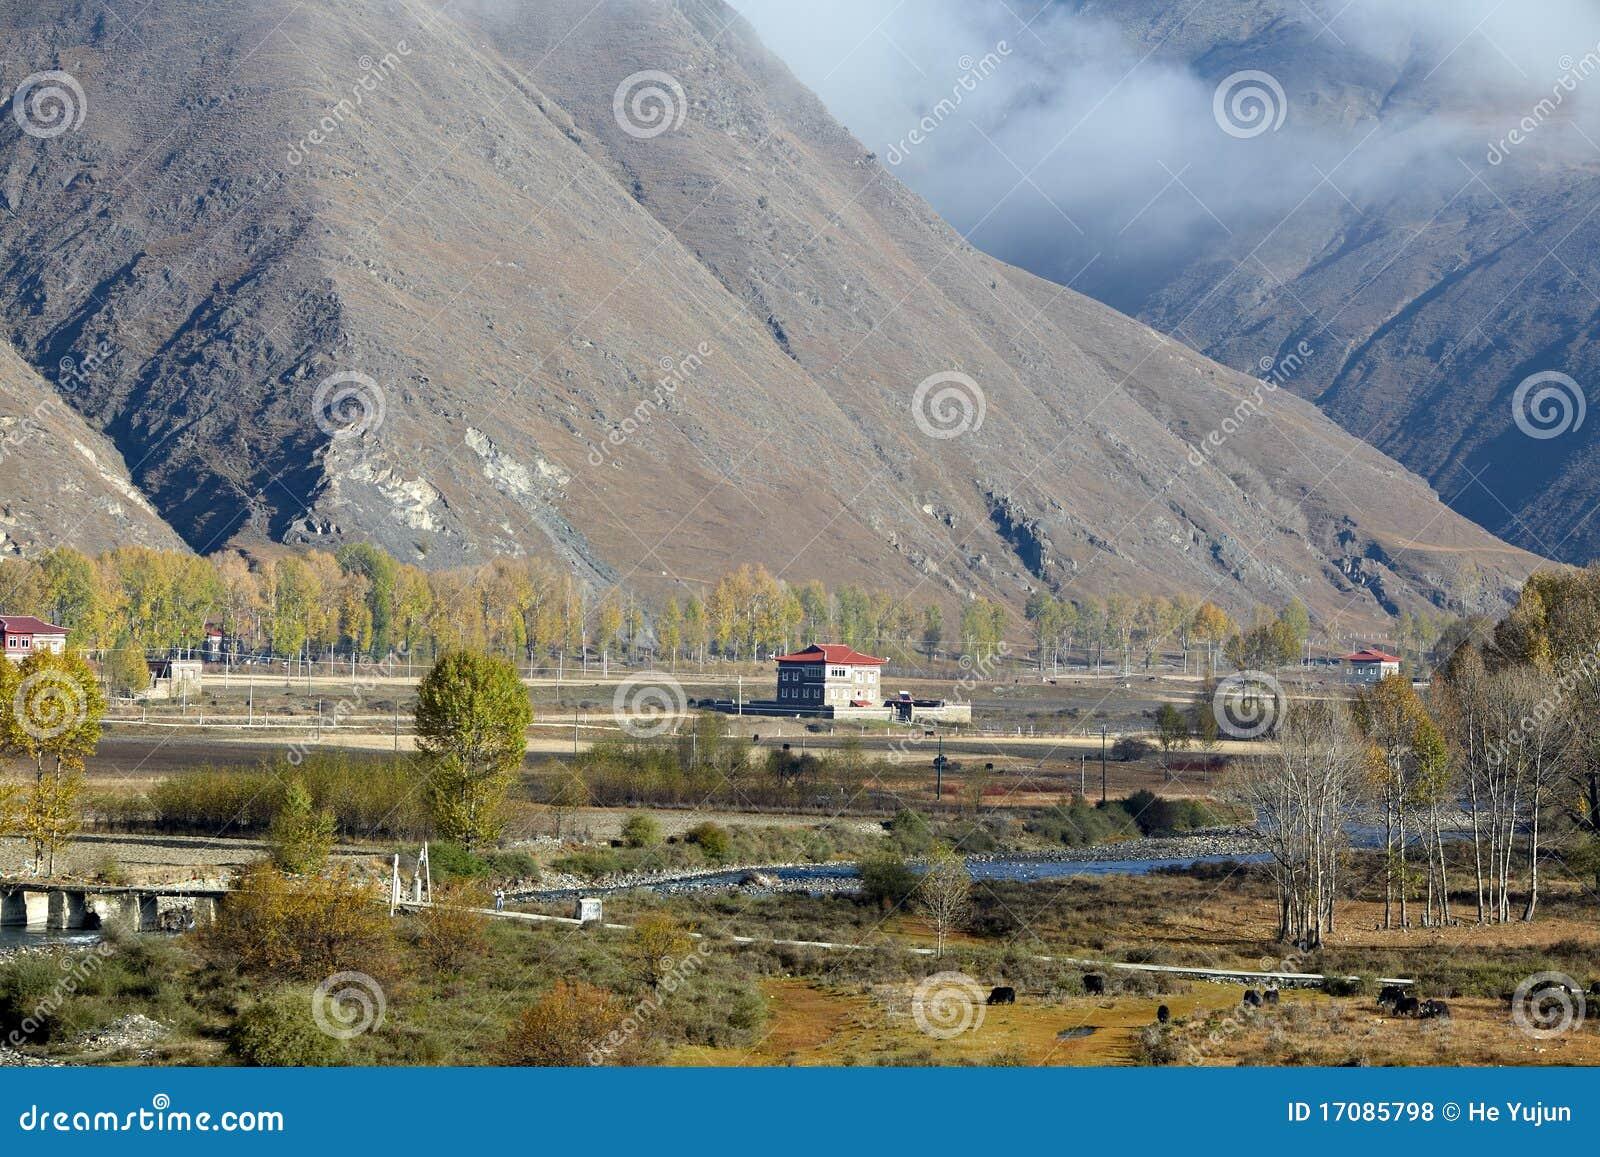 тибетское село